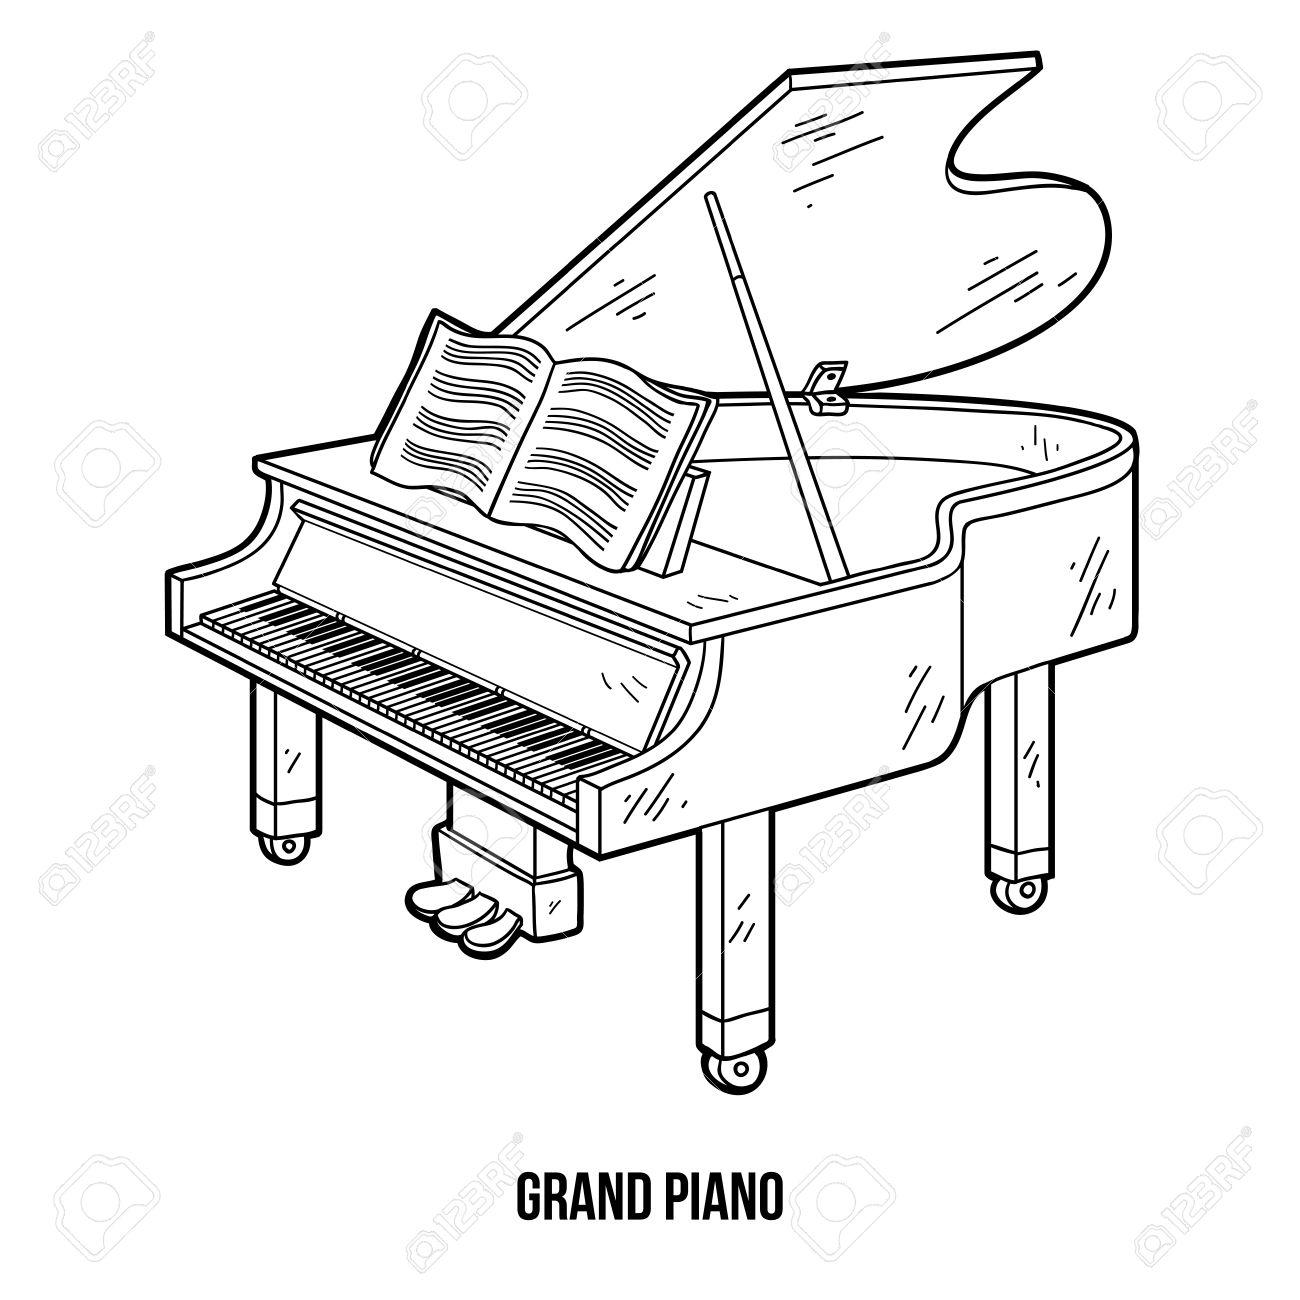 Musical Keyboard Drawing at GetDrawings | Free download